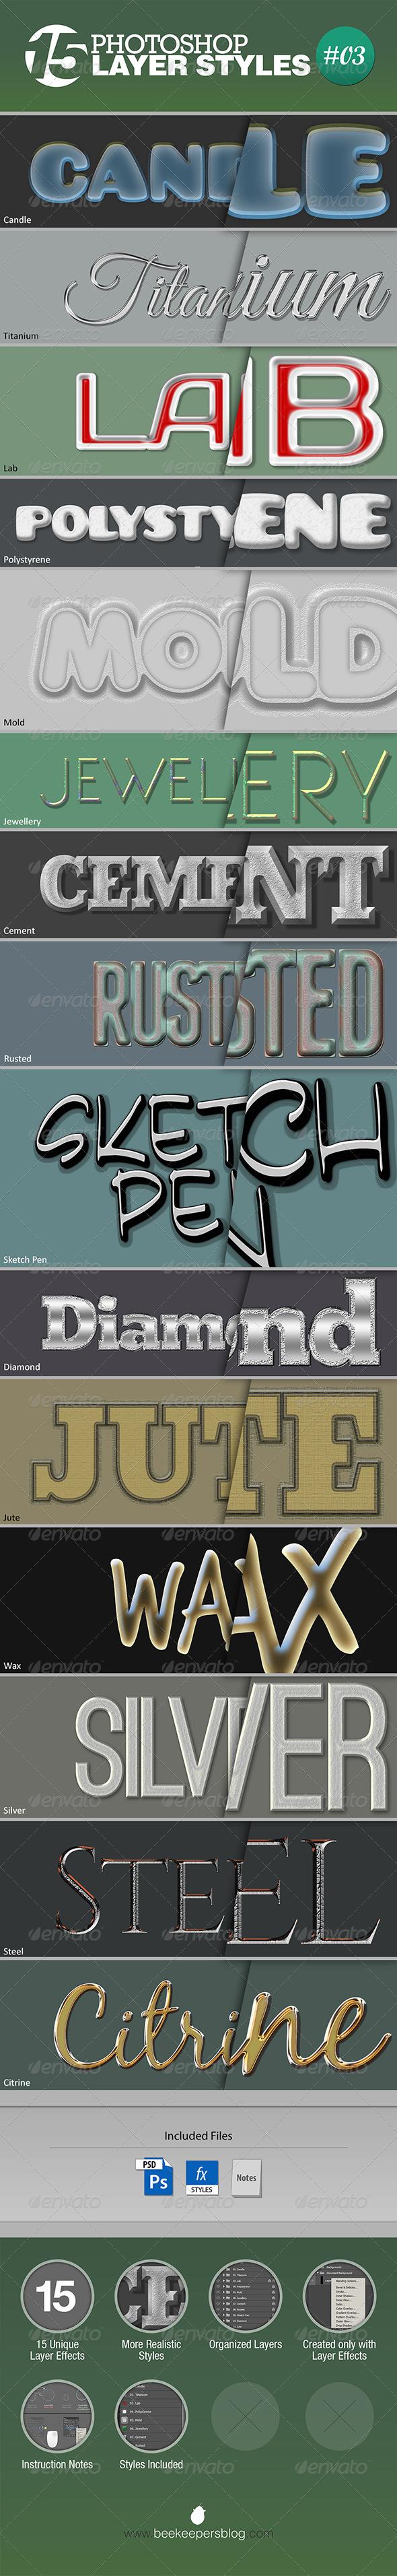 GraphicRiver 15 Unique Photoshop Layer Styles #03 7513729